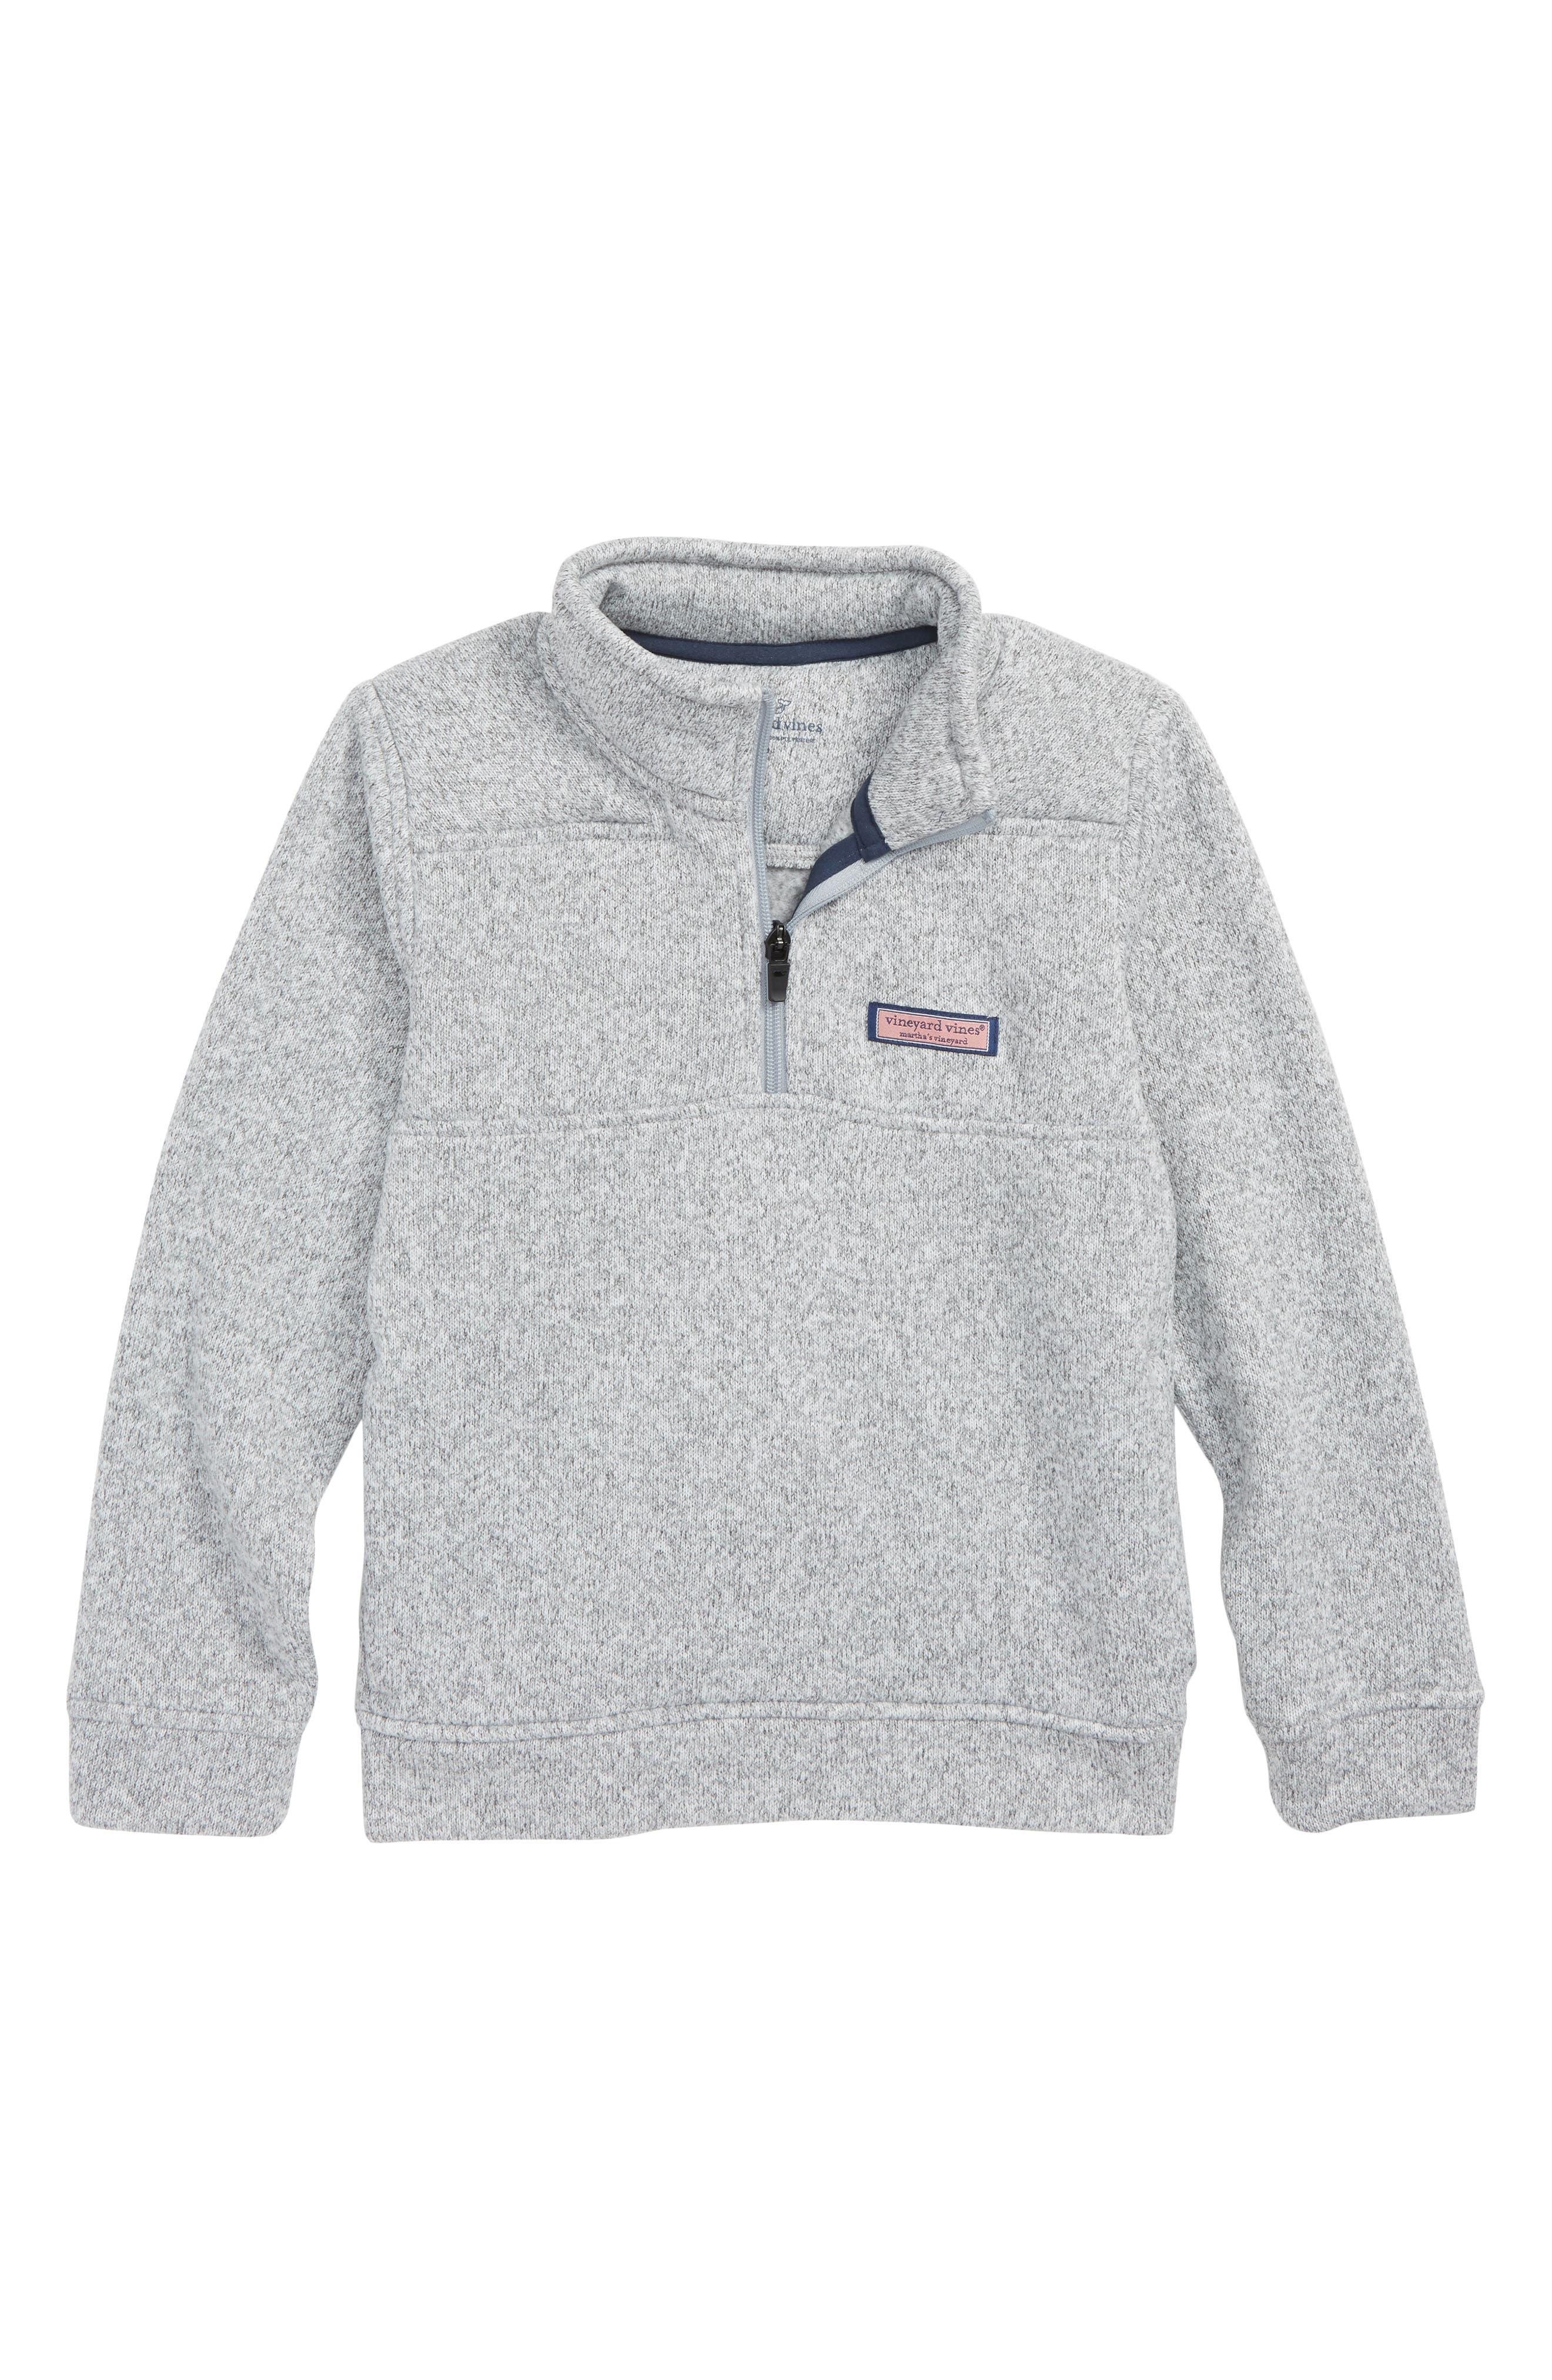 Fleece Shep Sweatshirt,                             Main thumbnail 1, color,                             GRAY HEATHER